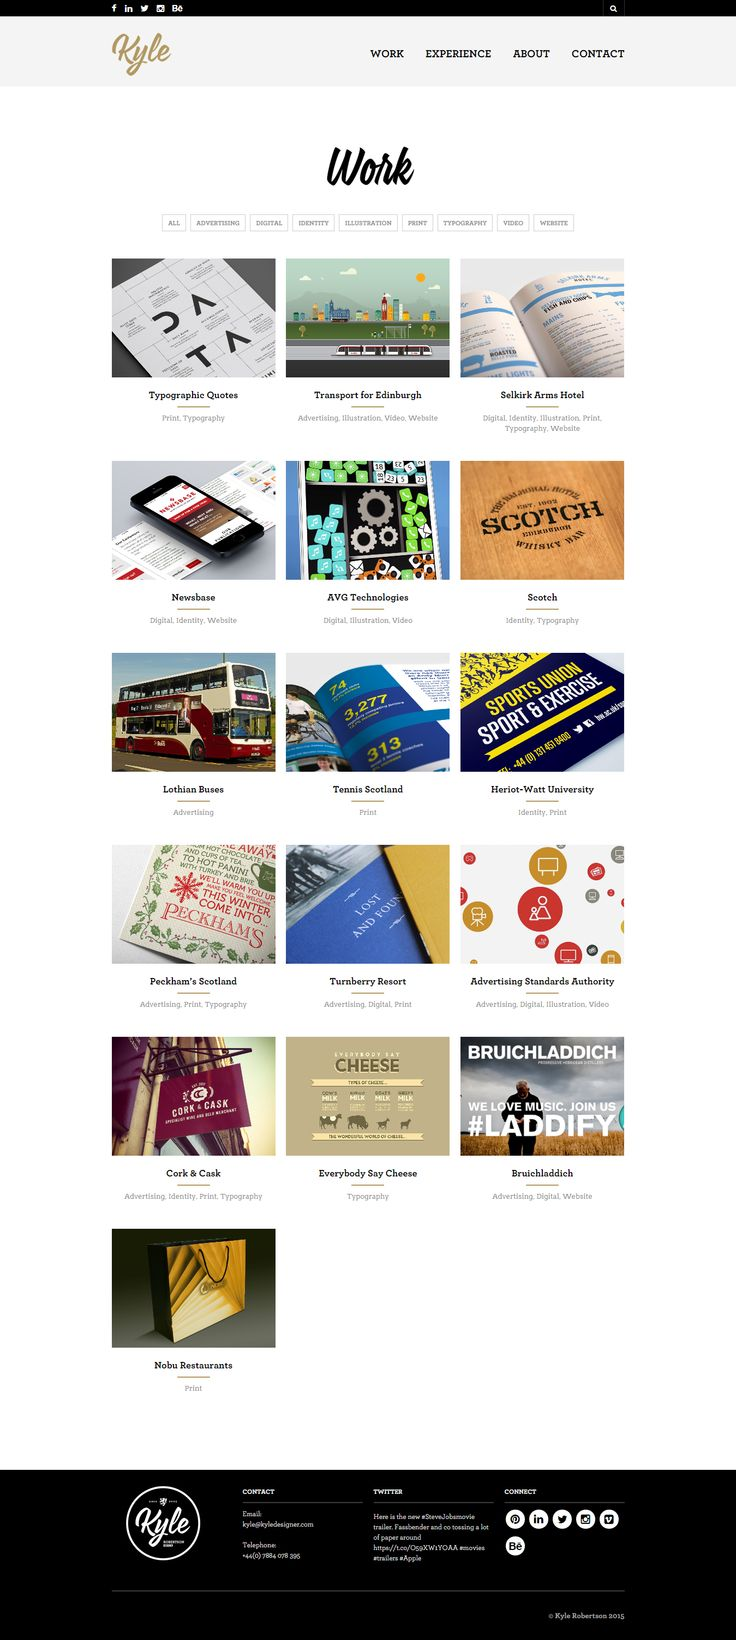 Kyle Robertson is a talented Senior Designer who uses The Retailer WP theme to build beautiful sites with ease. http://www.getbowtied.com/the-retailer-customer-stories-meet-kyle-of-kyledesigner-com/?utm_source=pinterest.com&utm_medium=social&utm_content=kyle-designer&utm_campaign=customer-stories #customerstories #wordpress #wordpressthemes #customerspotlight #designers #retailer